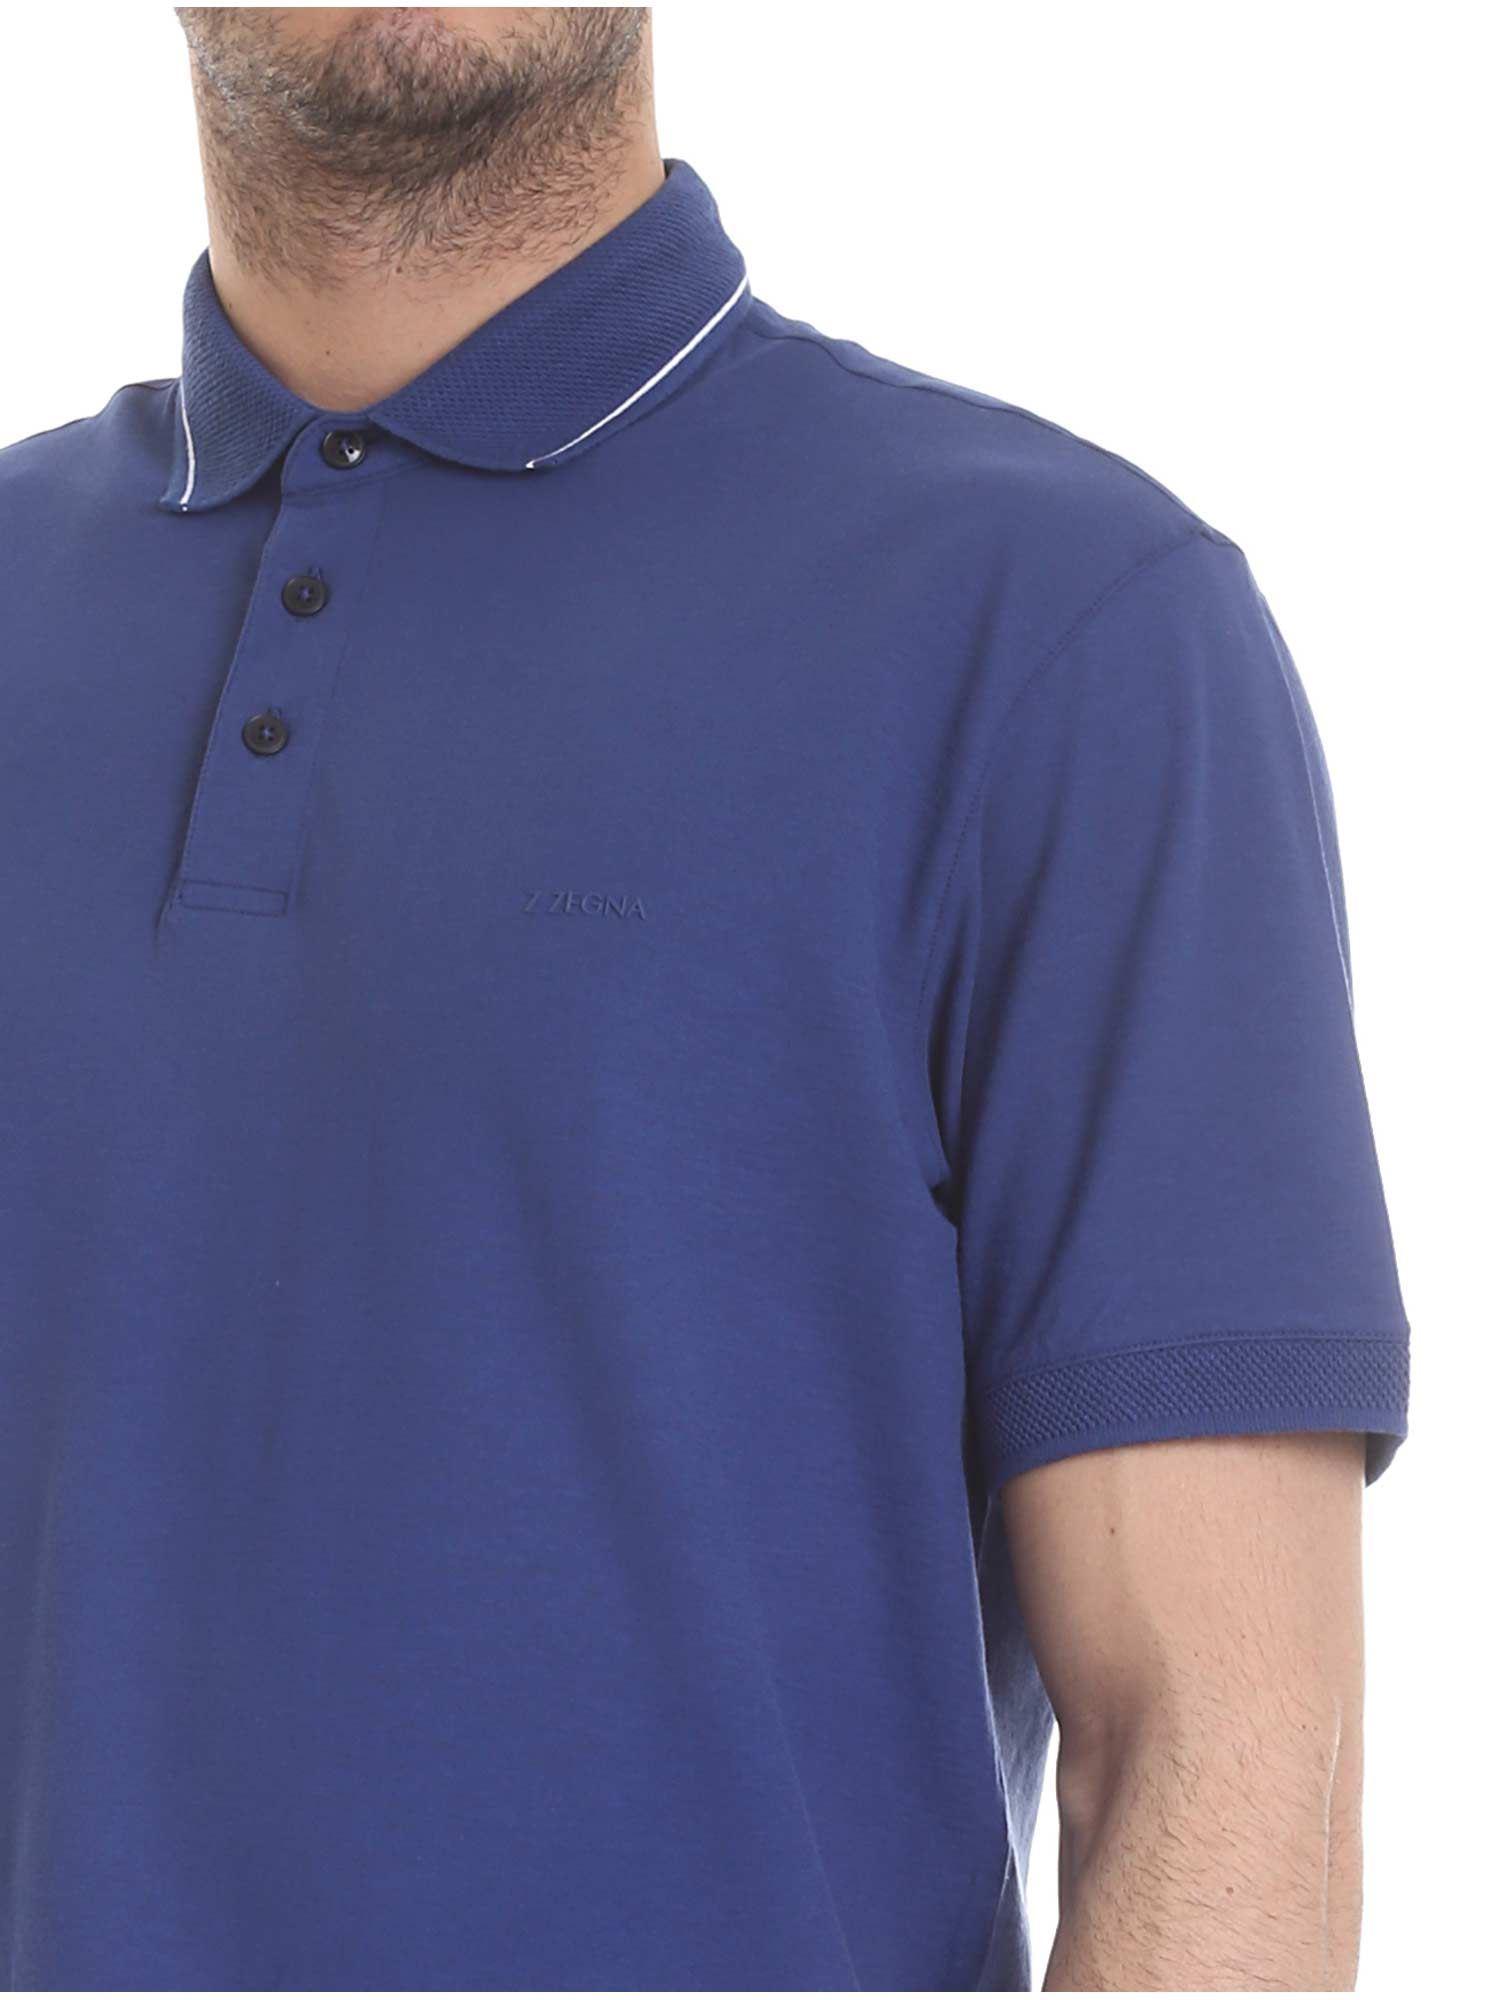 9596d0b50 Z Zegna - Blue Polo Shirt With White Stripes for Men - Lyst. View fullscreen